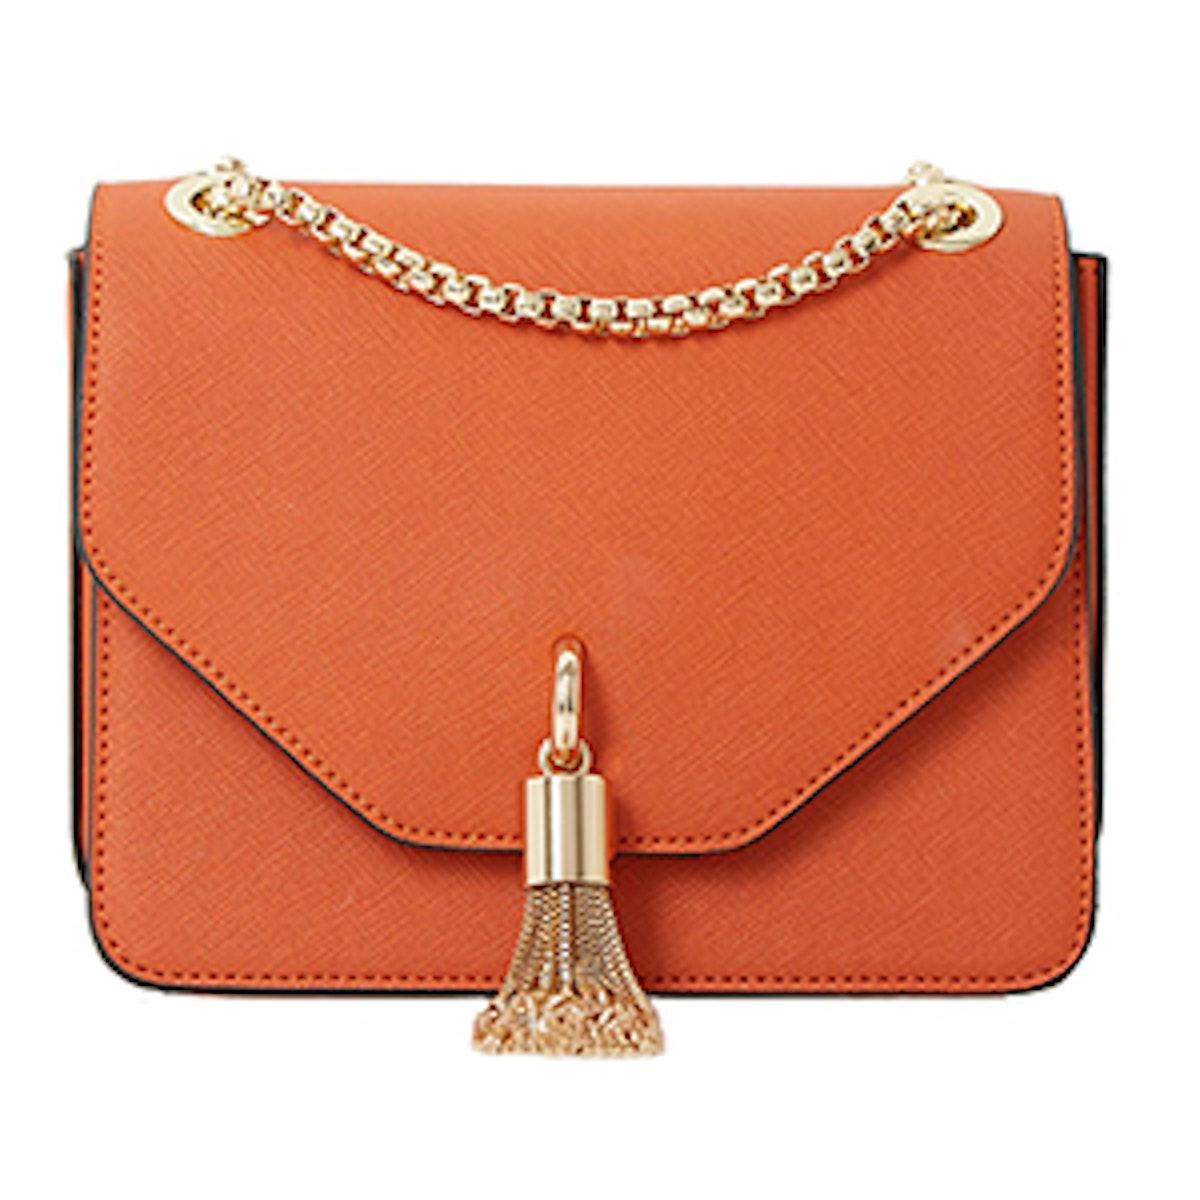 Metal Tassel Boxy Bag